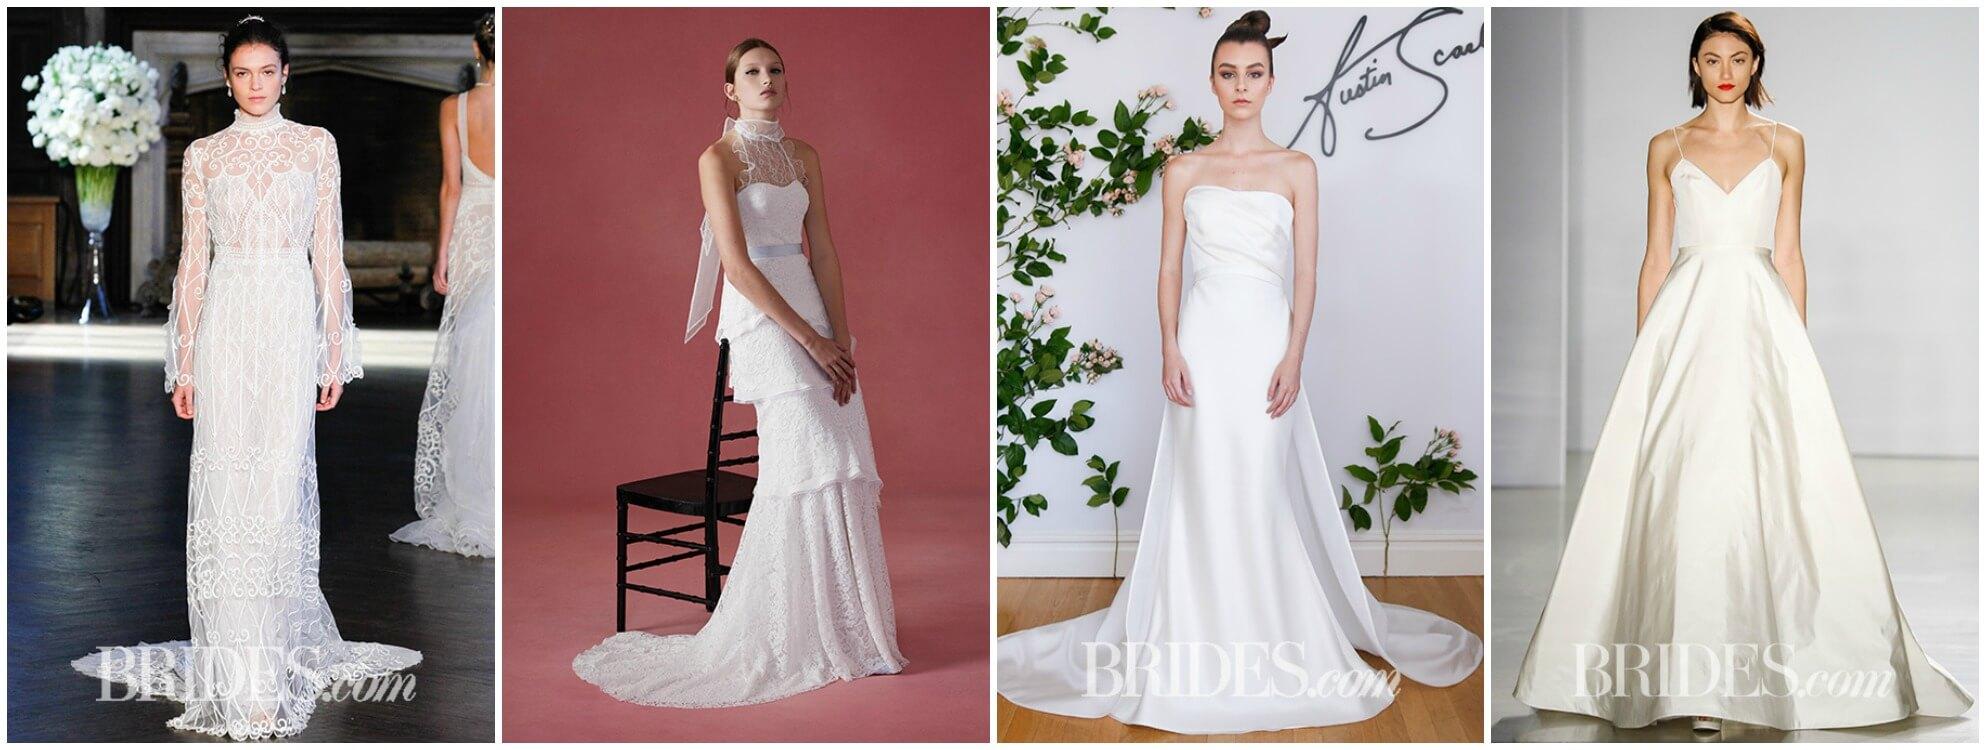 Fall2016Bridal-WeddingTrends-NTL